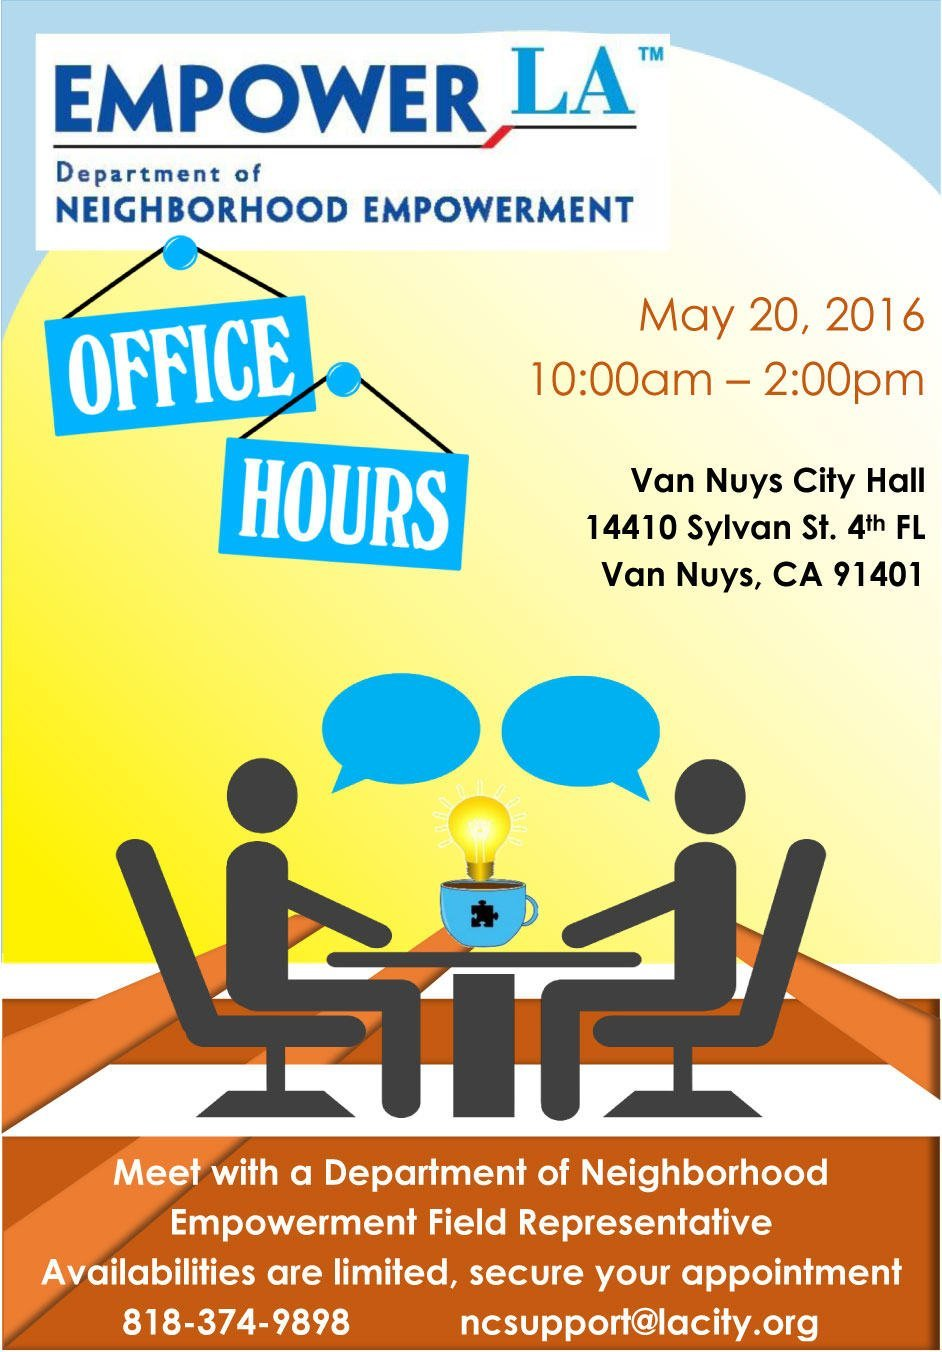 Department of Neighborhood Empowerment Office Hours May 20, 2016